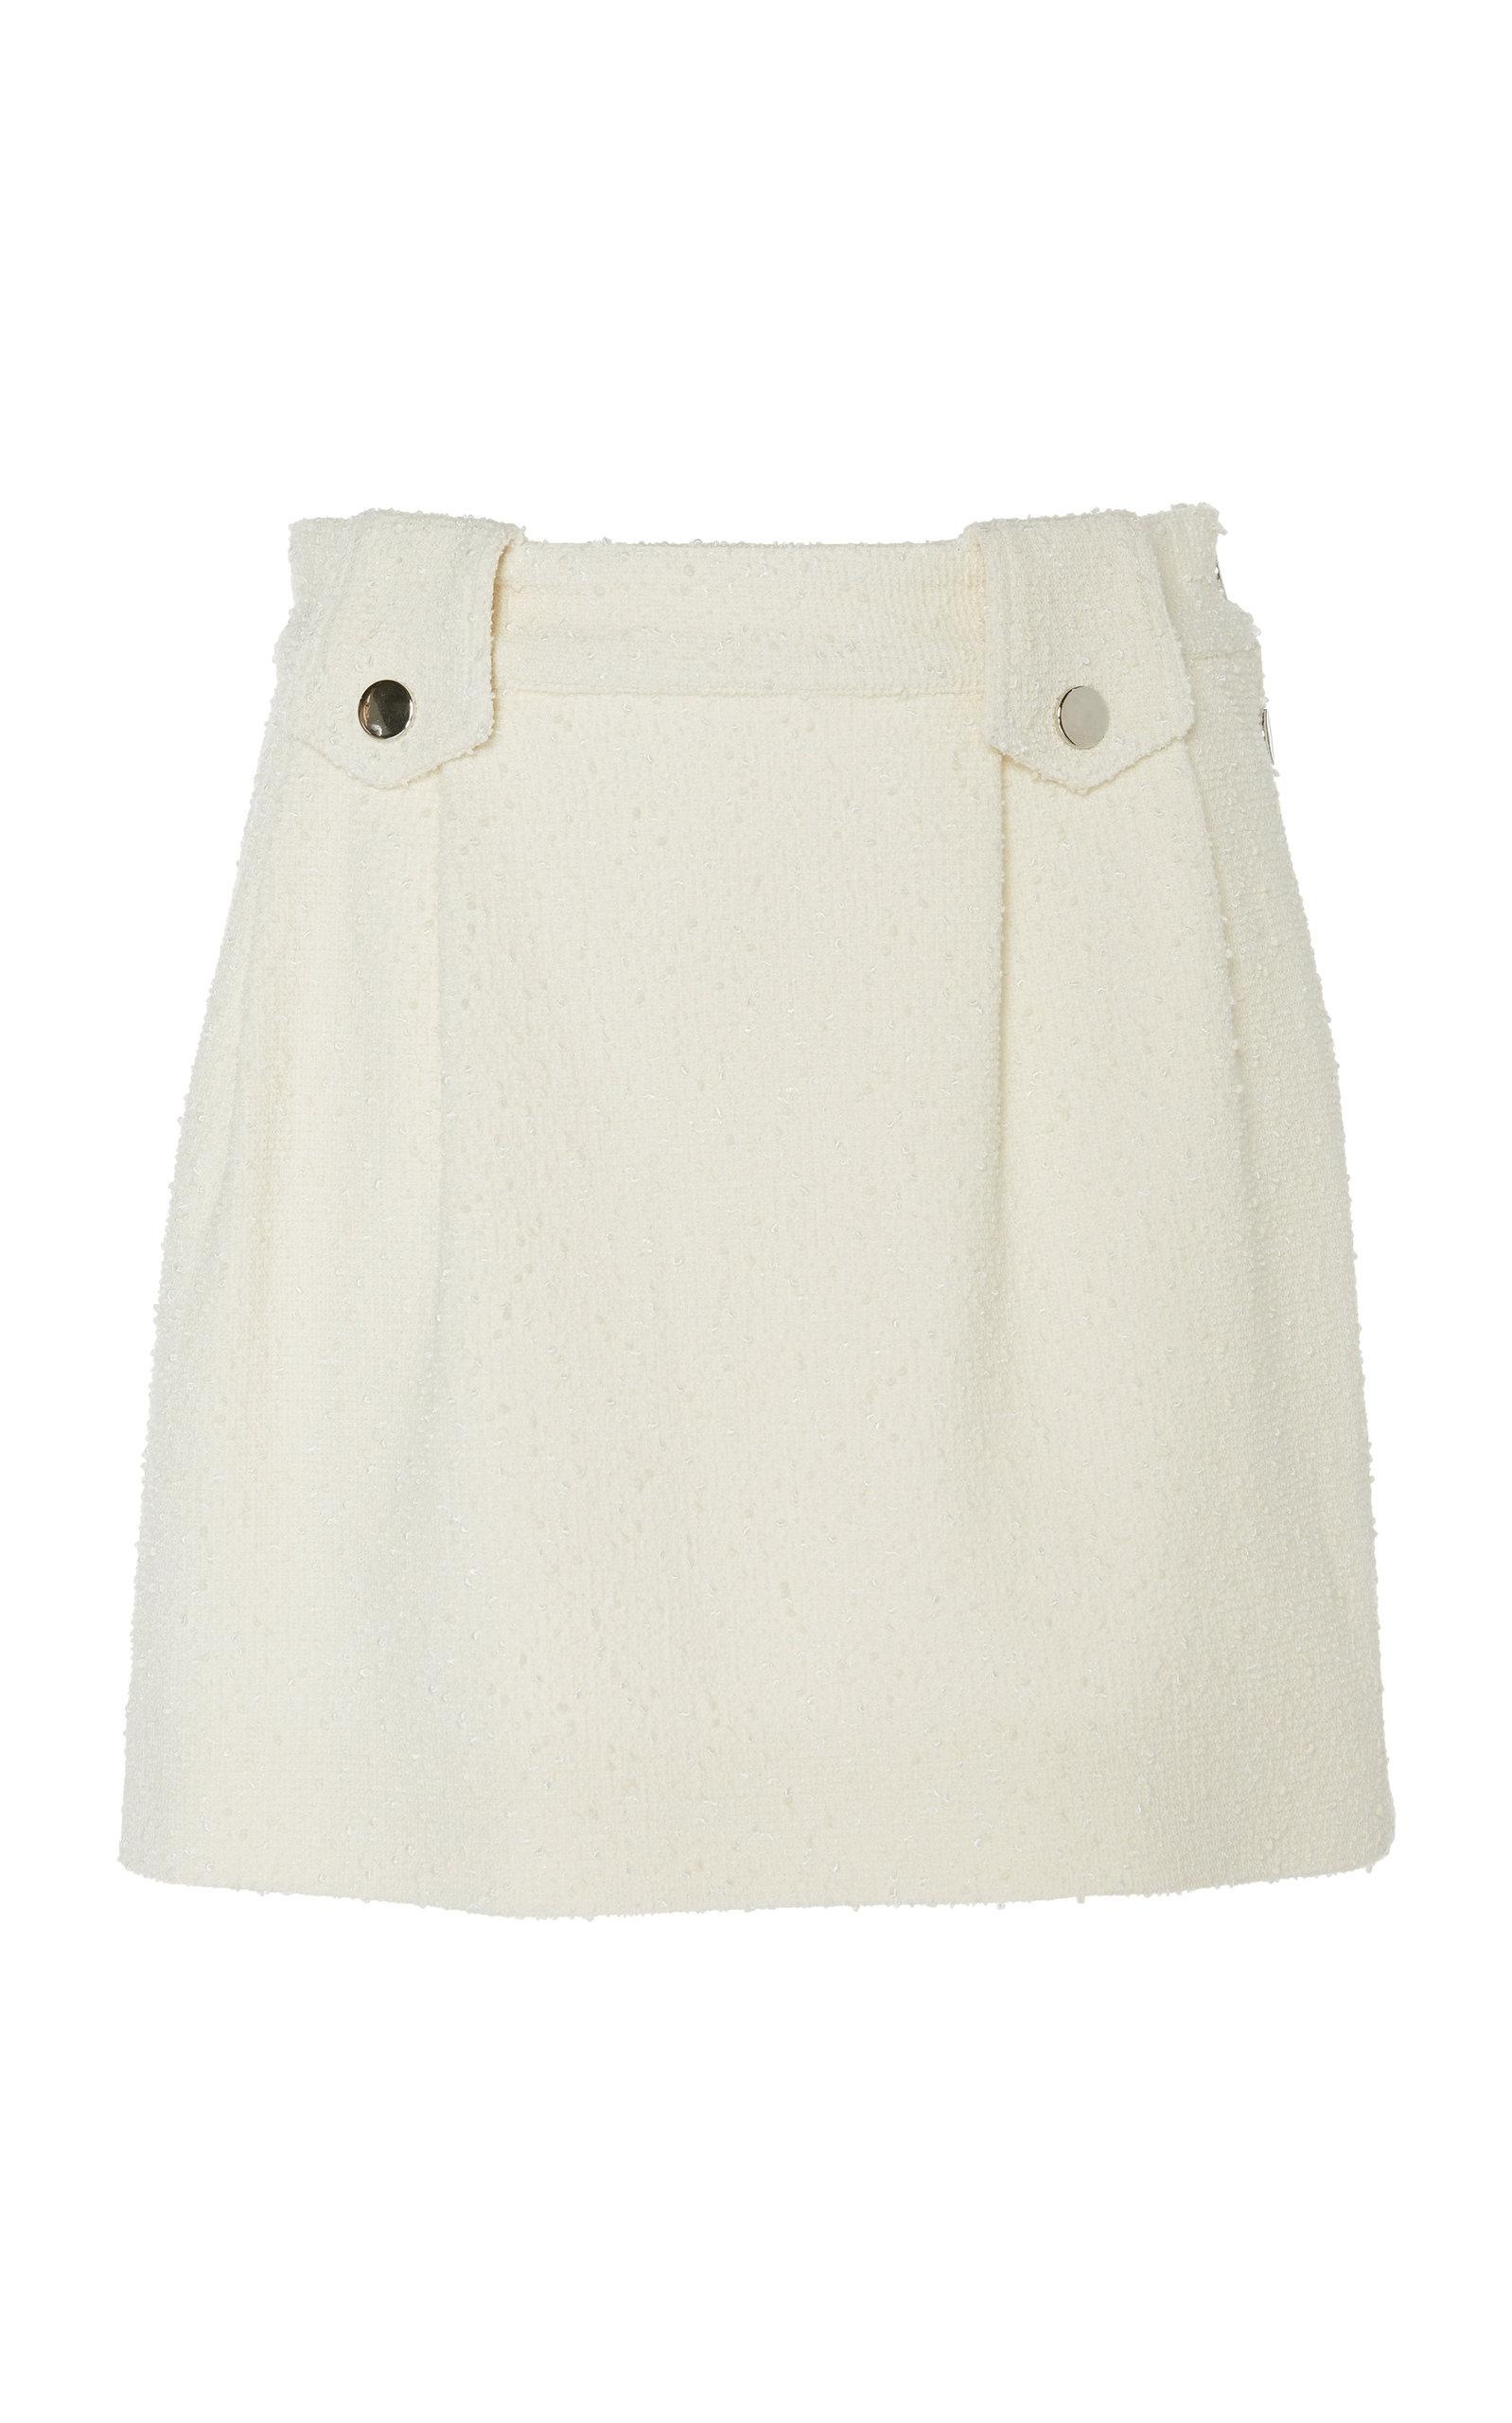 Cheap Sale Visit New Explore Sale Online Mini Elio Button Skirt Roseanna Discount Comfortable Jx529ndE